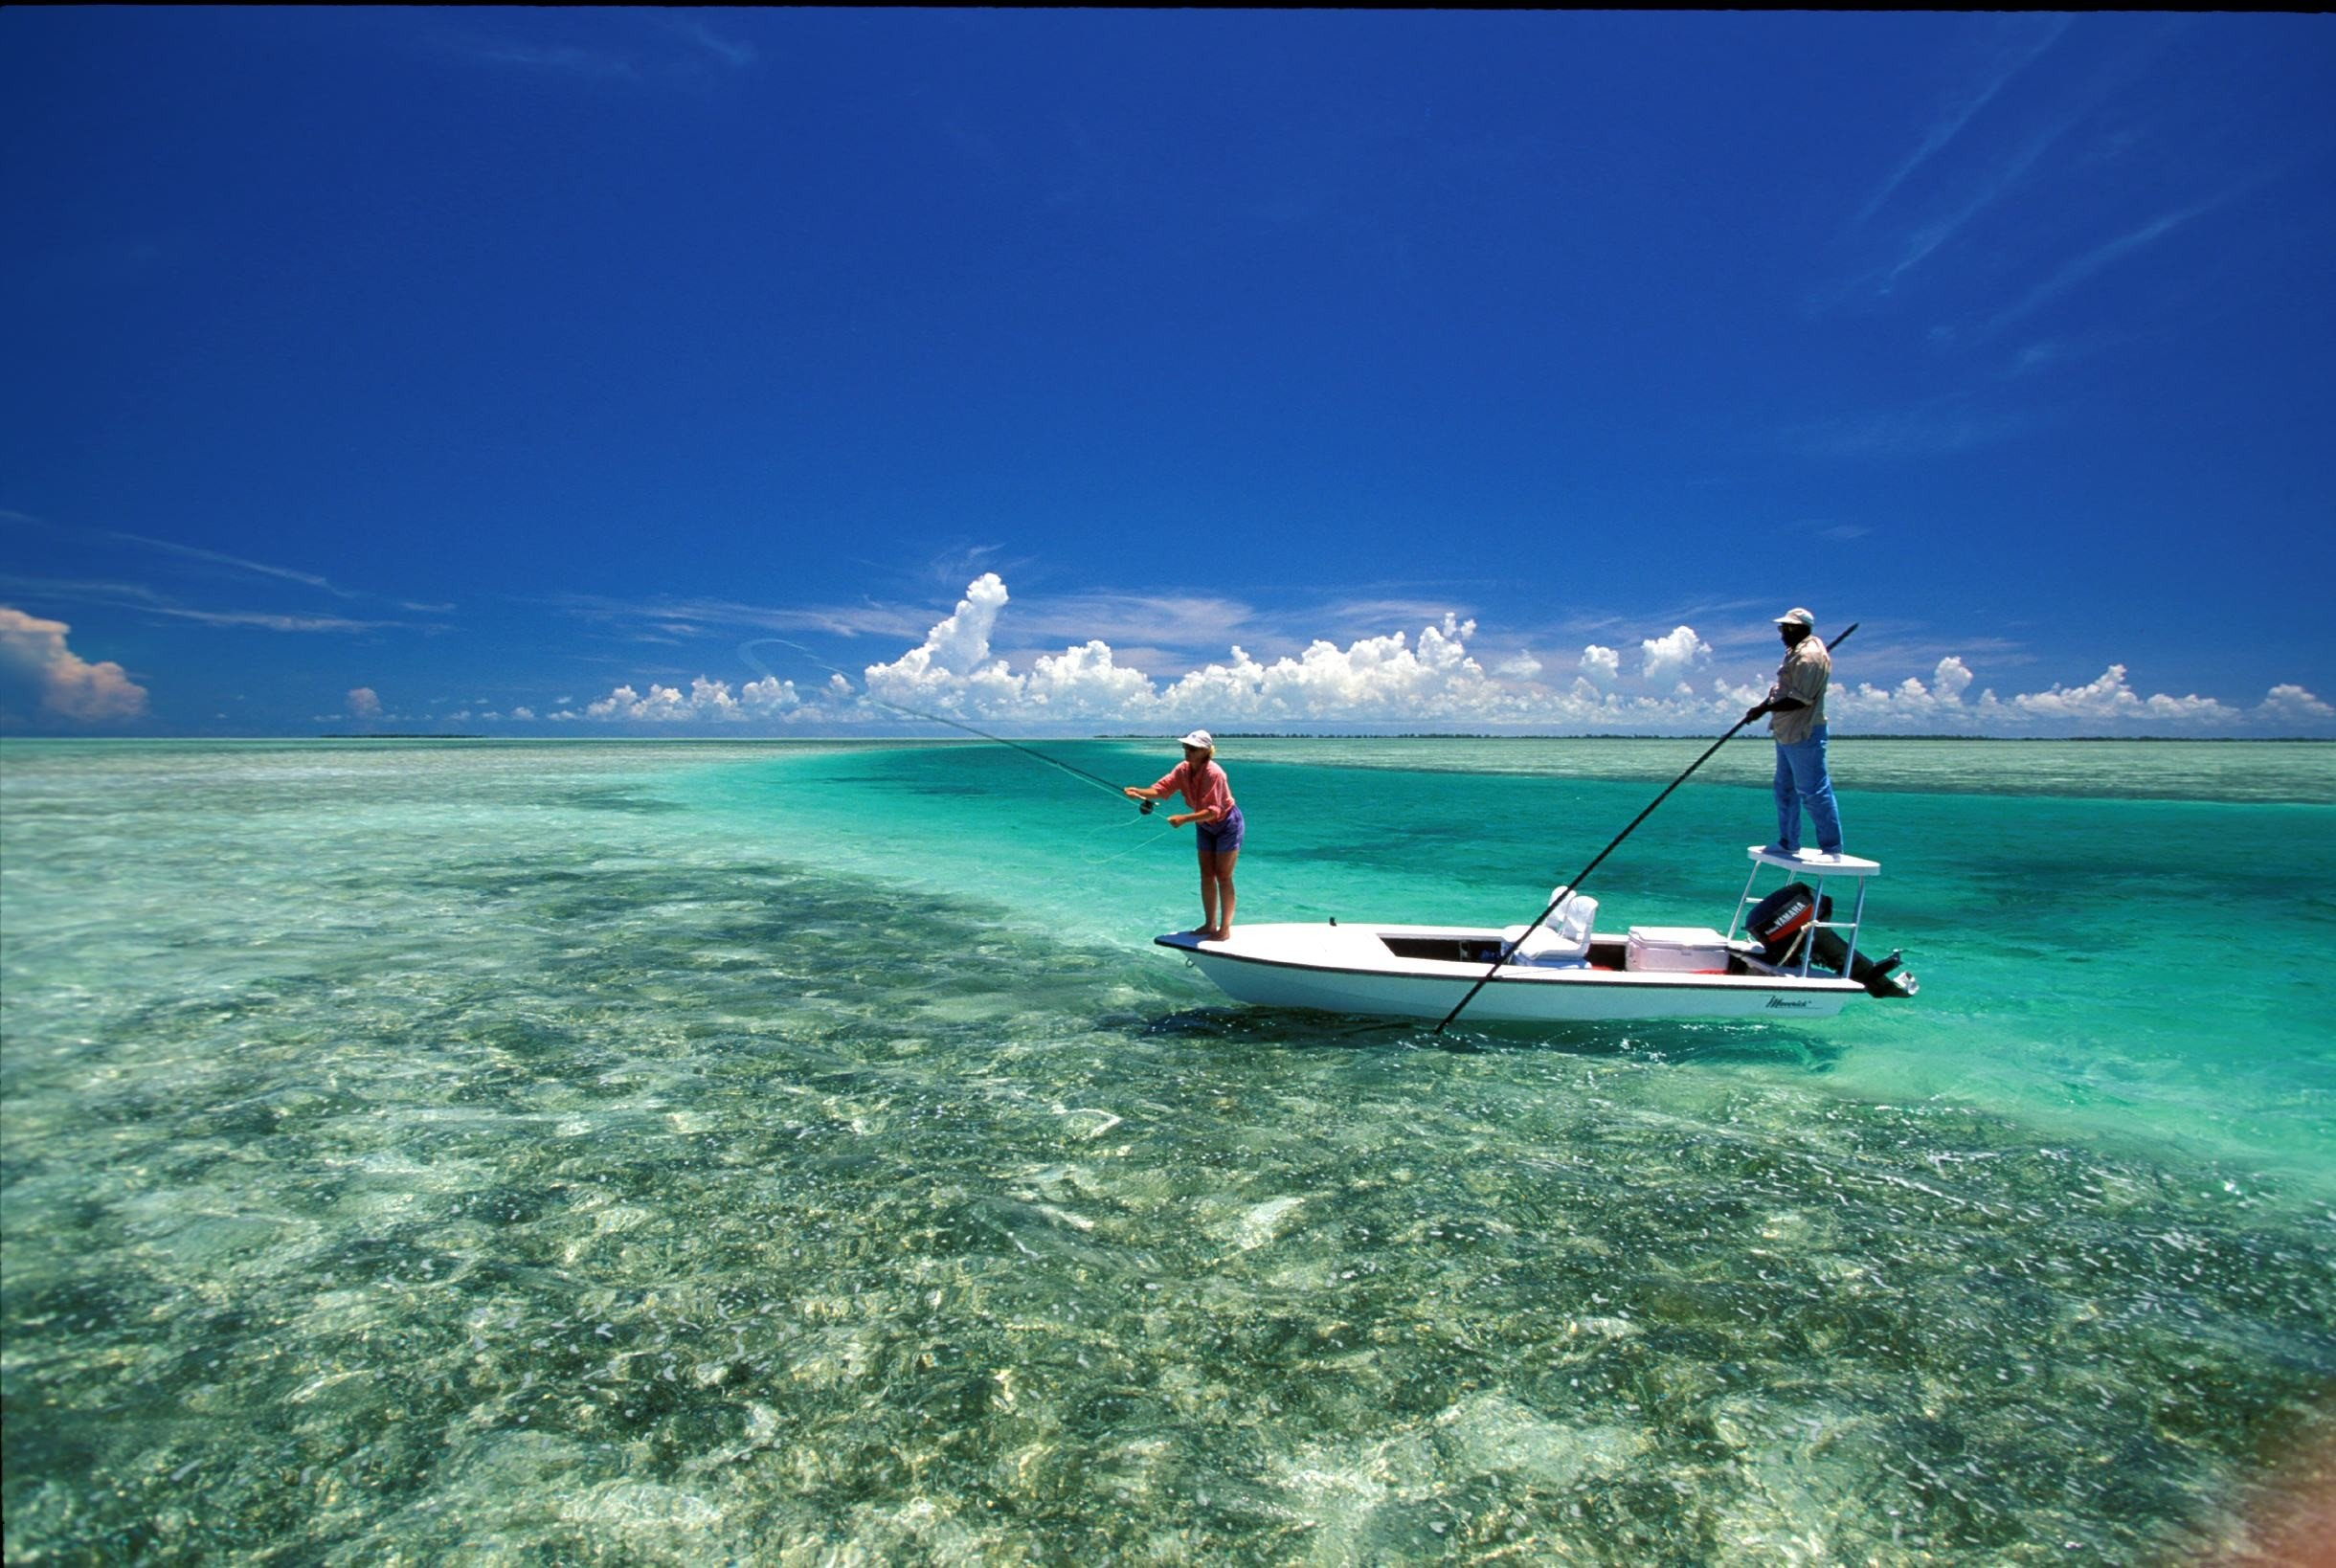 Hotels Islands Luxury Travel Trip Ideas water outdoor sky Boat Sea Ocean windsurfing caribbean vacation wind wave bay vehicle boating sailing Lagoon Coast Beach cape wind Island day